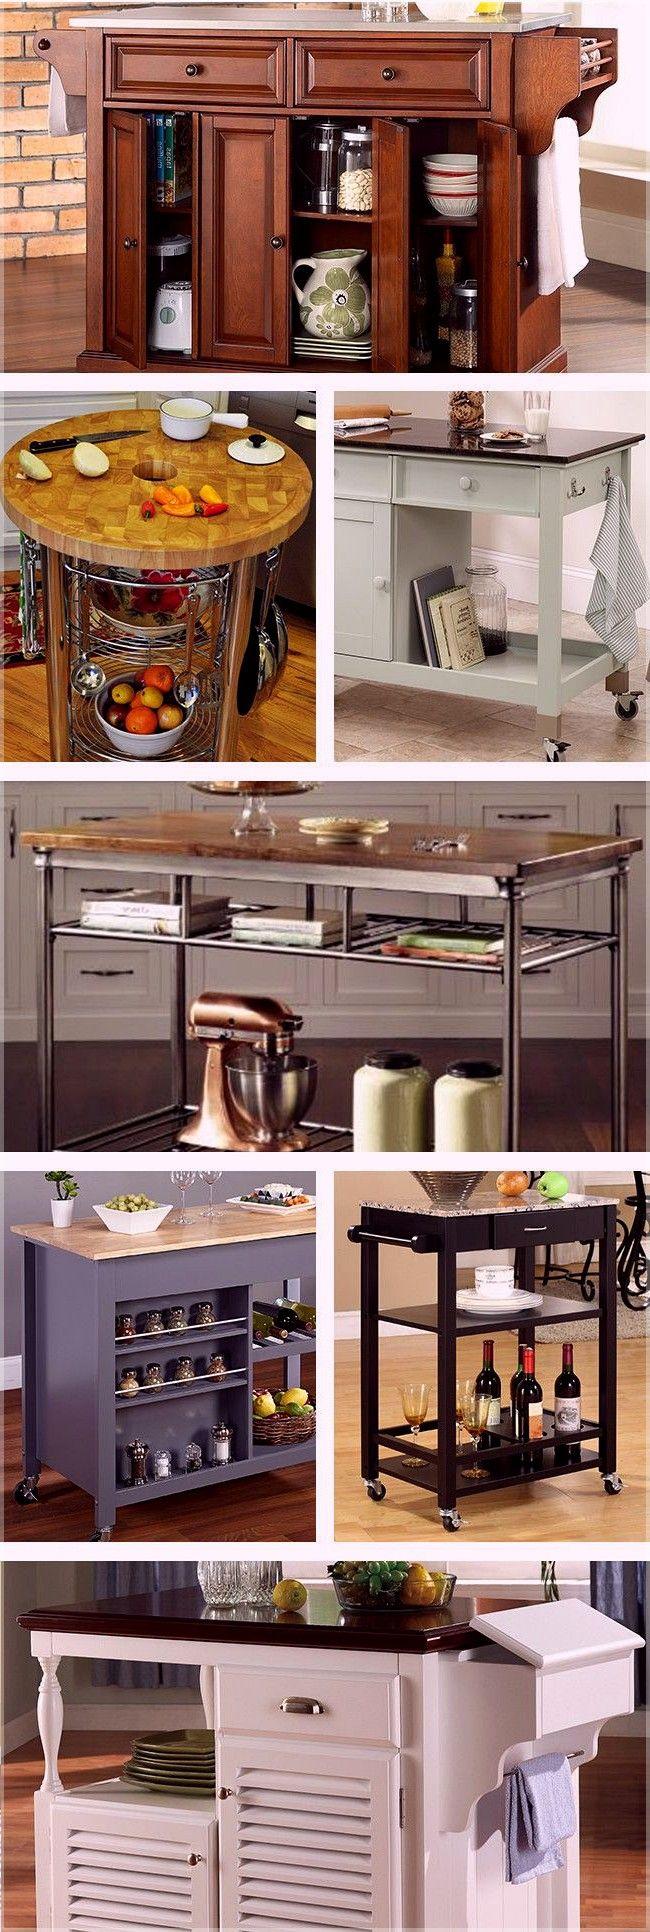 creative storage ideas for a small kitchen, kitchen ...